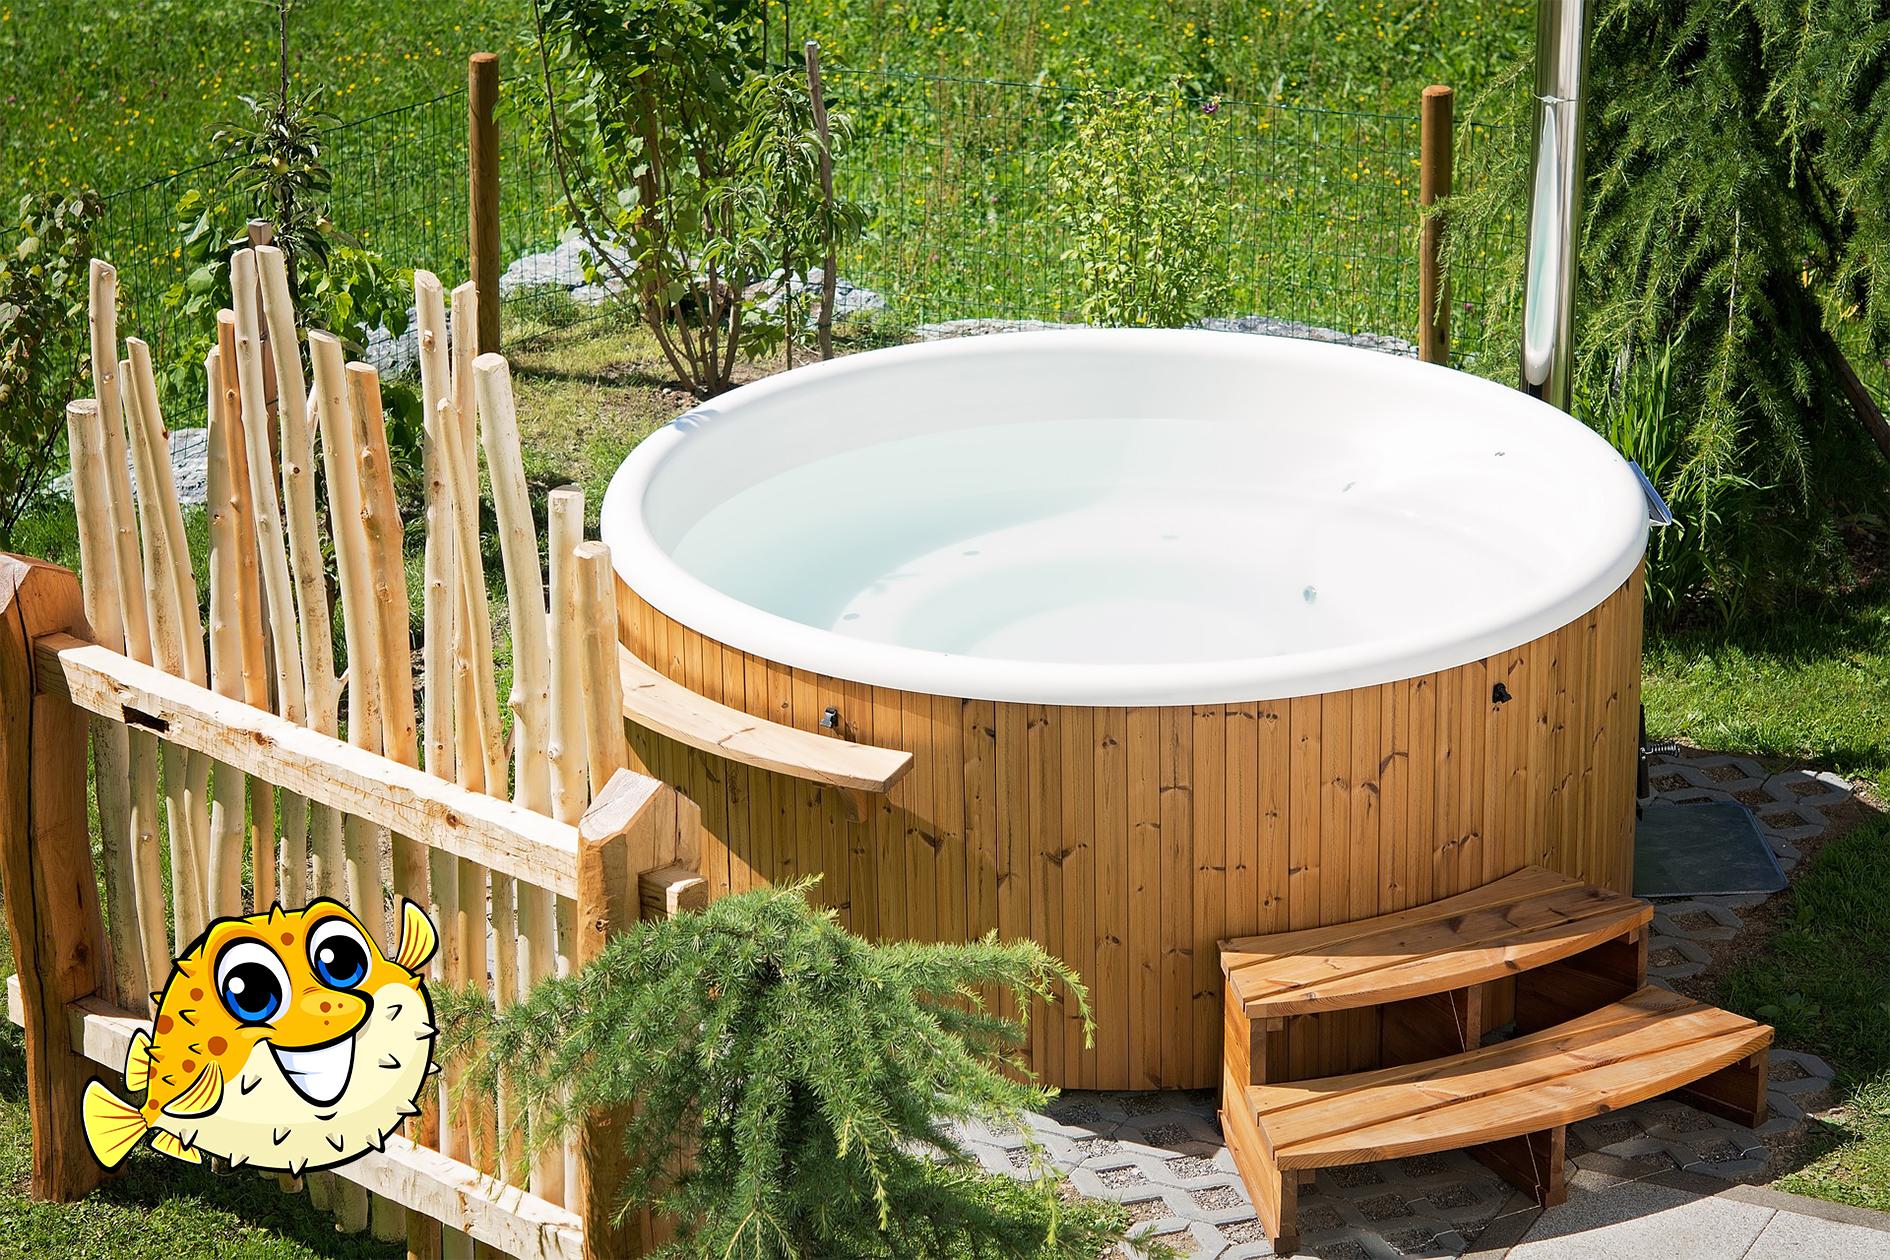 Handling Hot Tub Maintenance